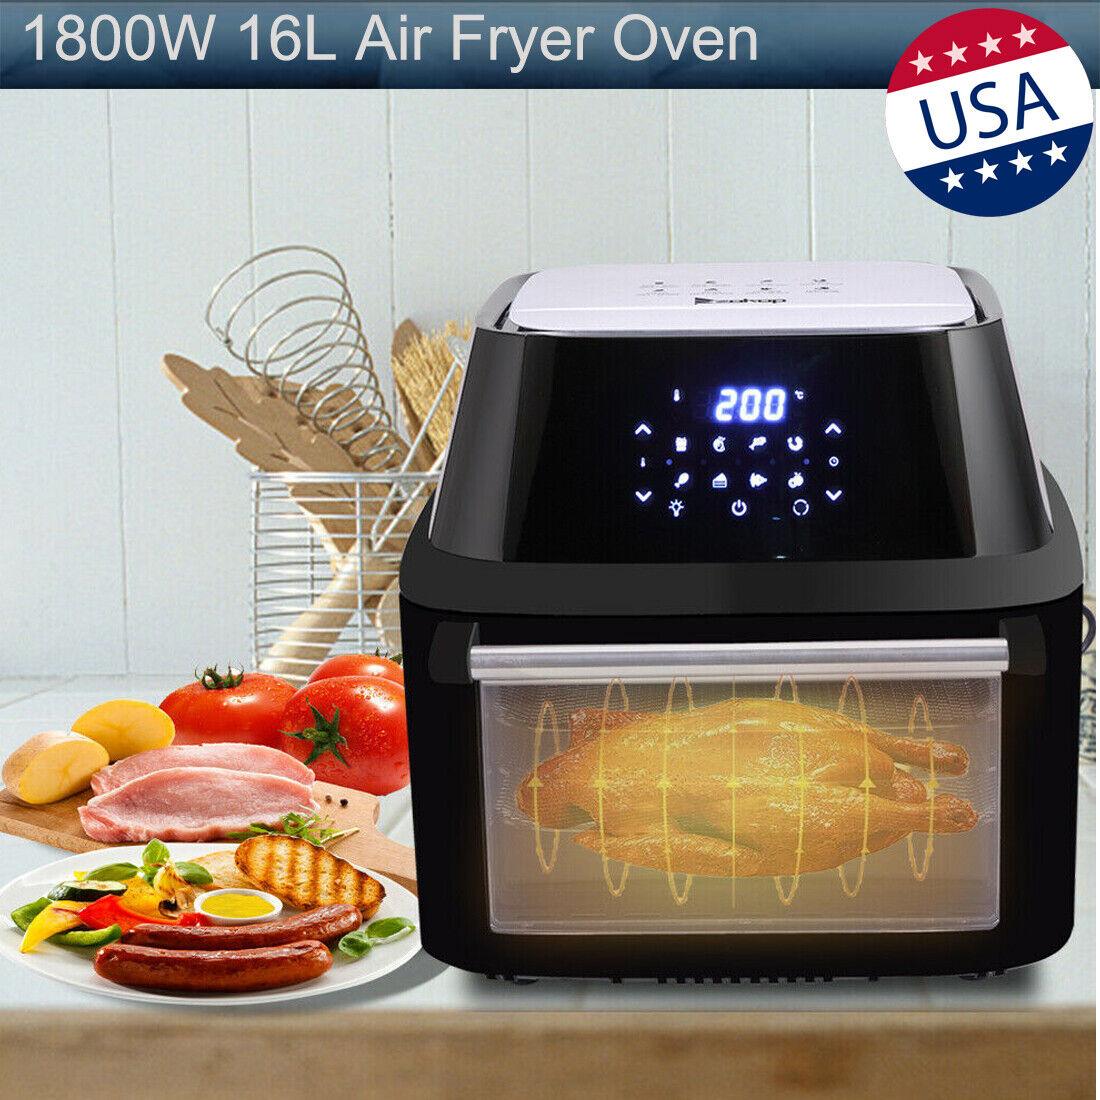 Farberware Digital Air Fryer Oven Rotisserie Toaster 3.2qt